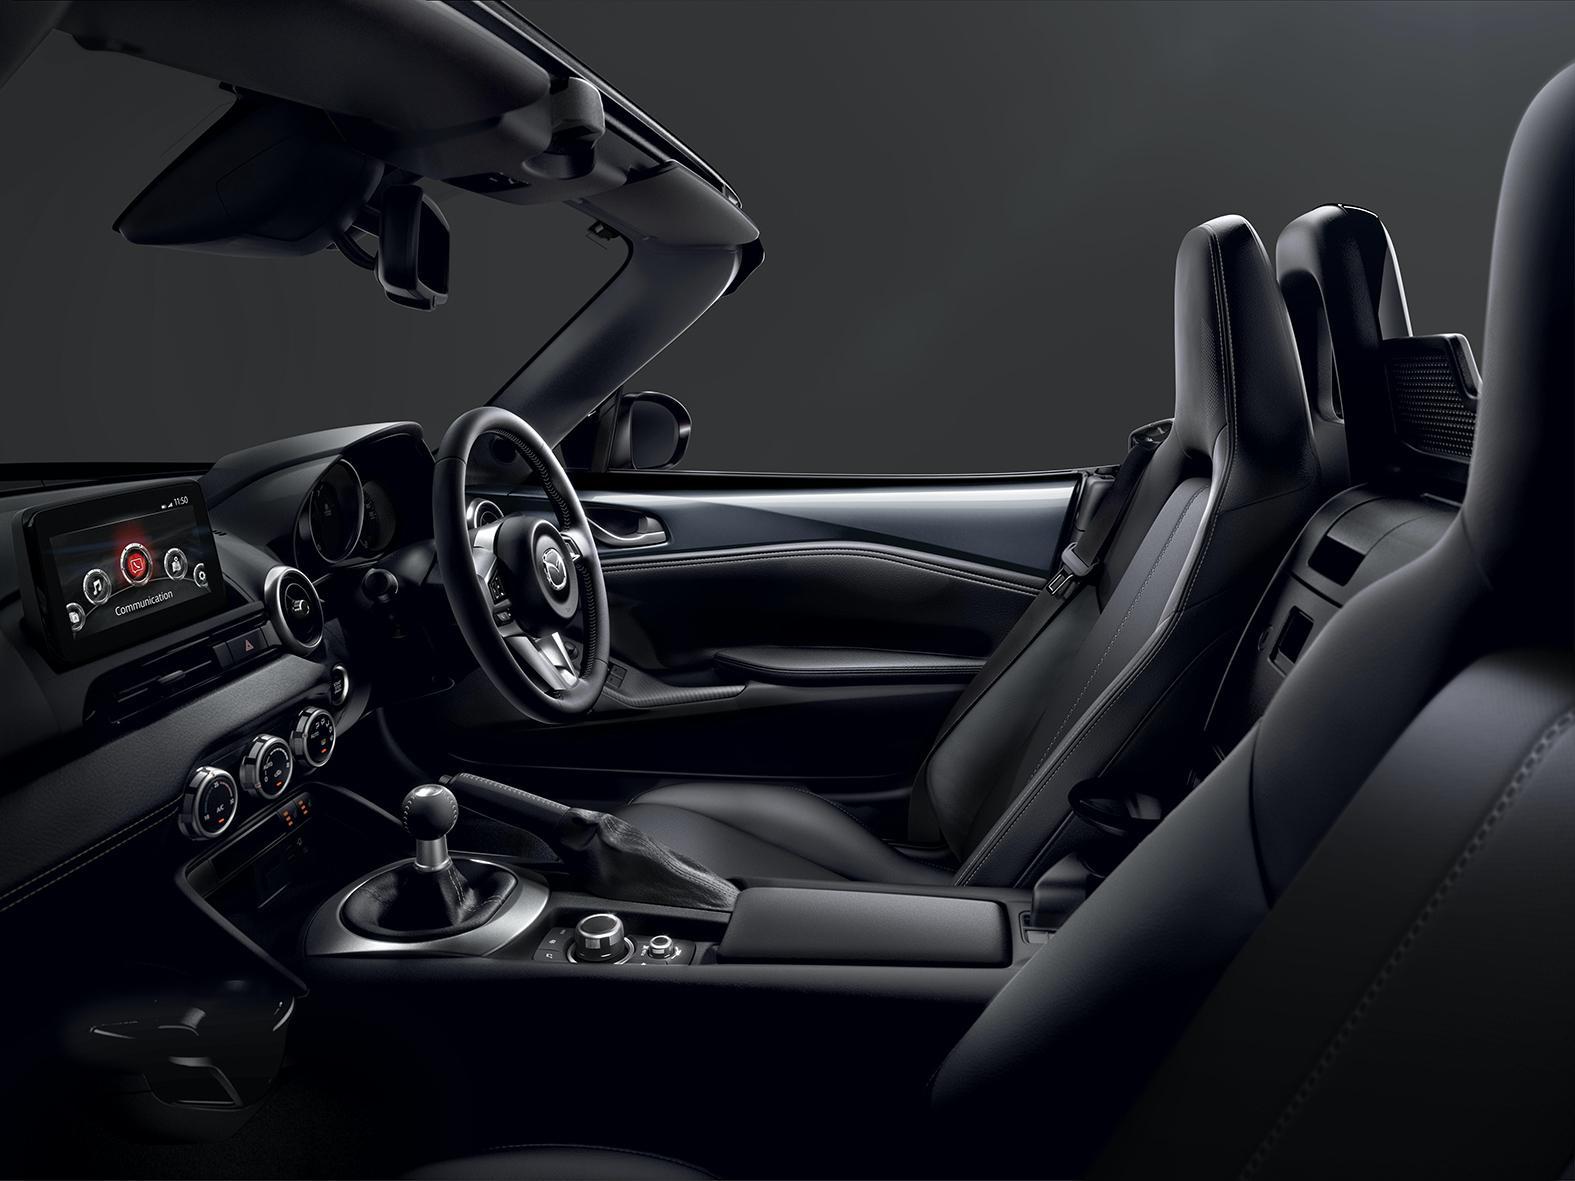 Mazda-MX-5-and-CX-5-2020-6